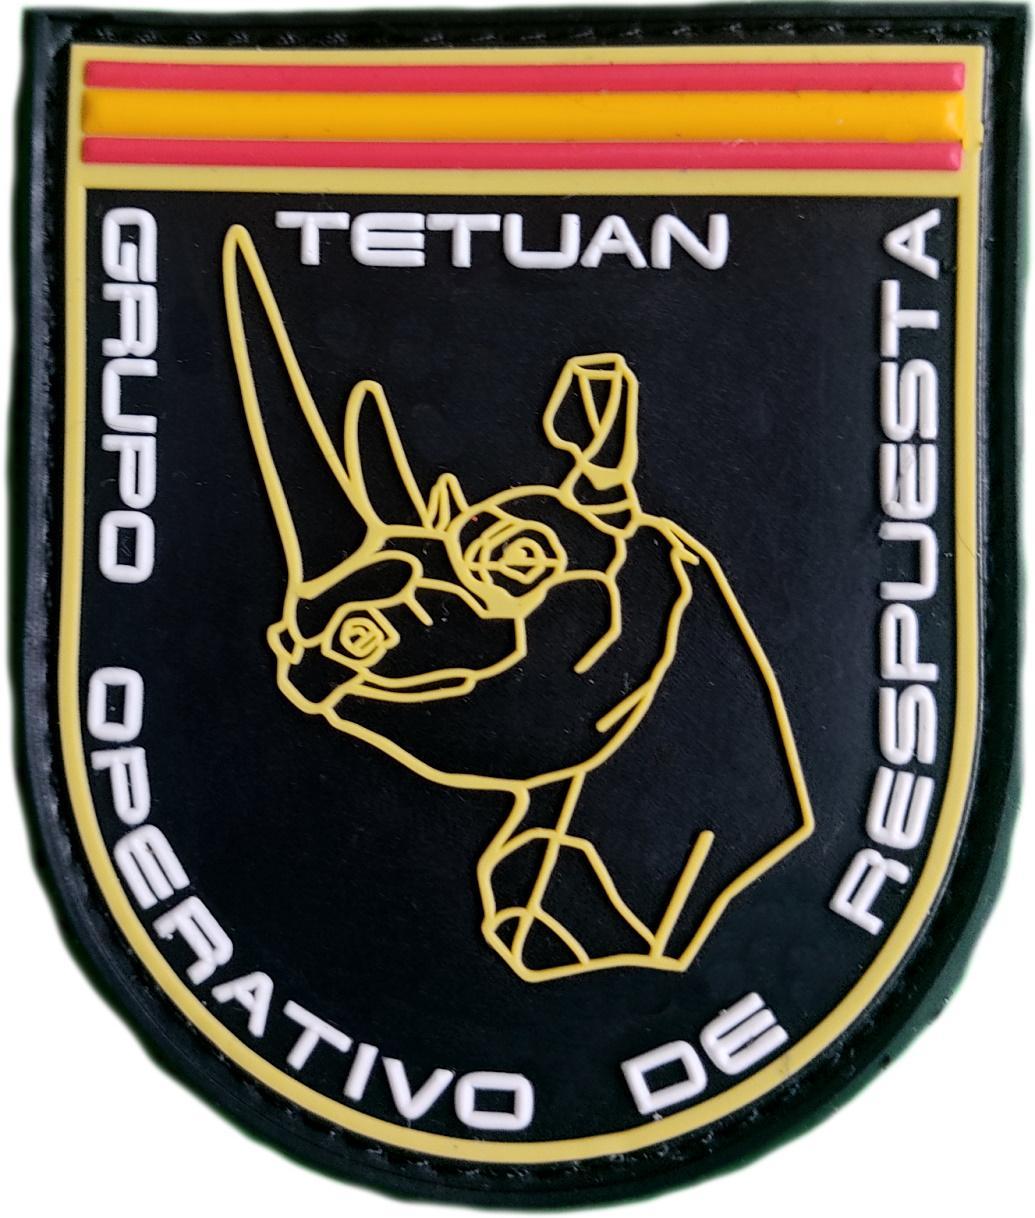 Policía Nacional CNP GOR Tetuán grupo operativo de respuesta Madrid parche insignia emblema distintivo